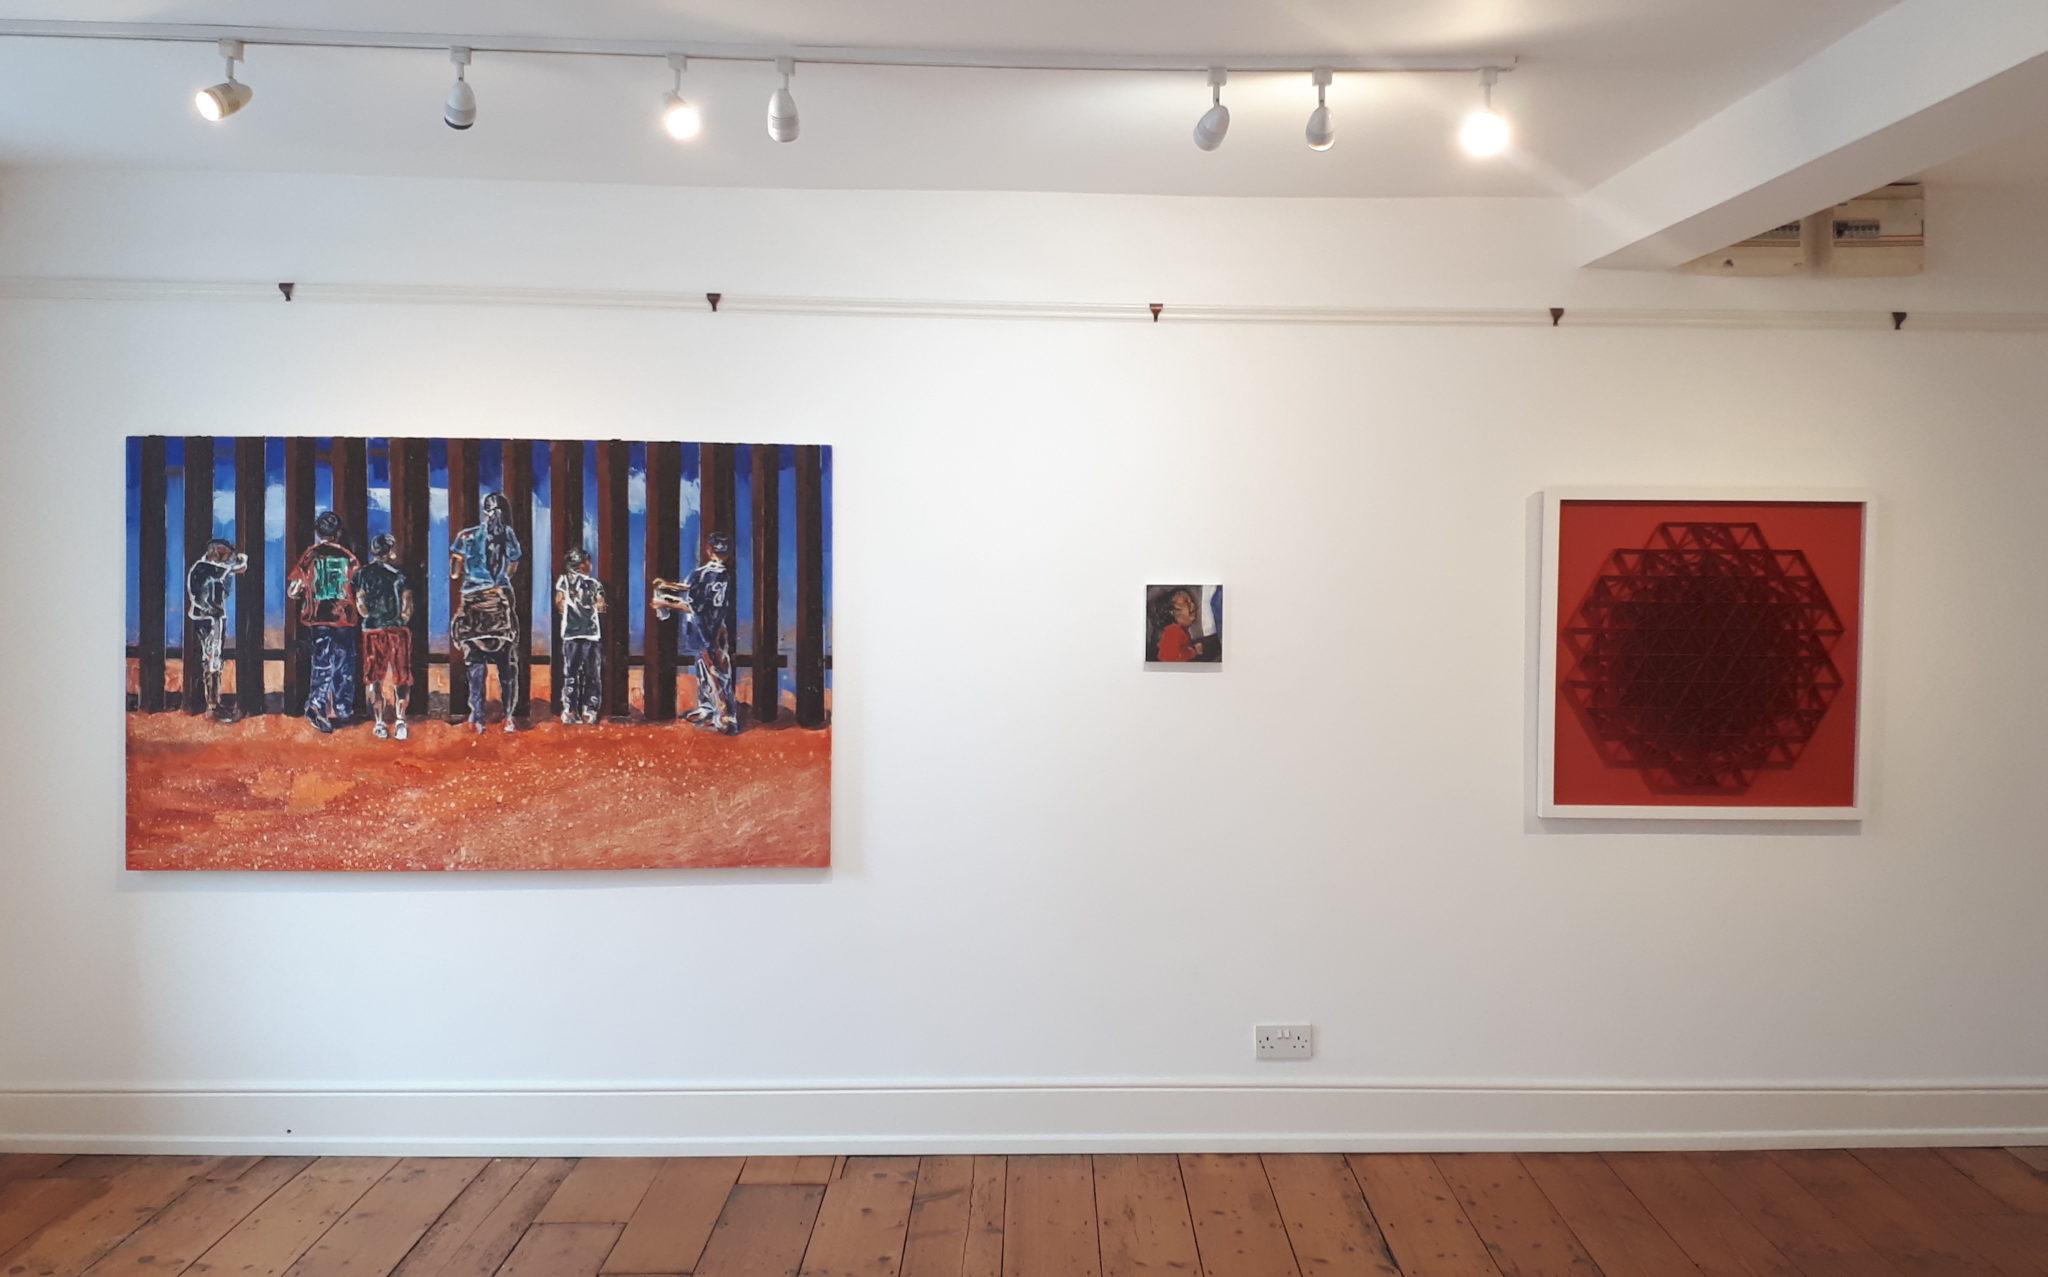 Perspective & Disengagement | Miriam Fitzgerald Juskova & Gabrielle Flynn at Solas Art Gallery, Ballinamore